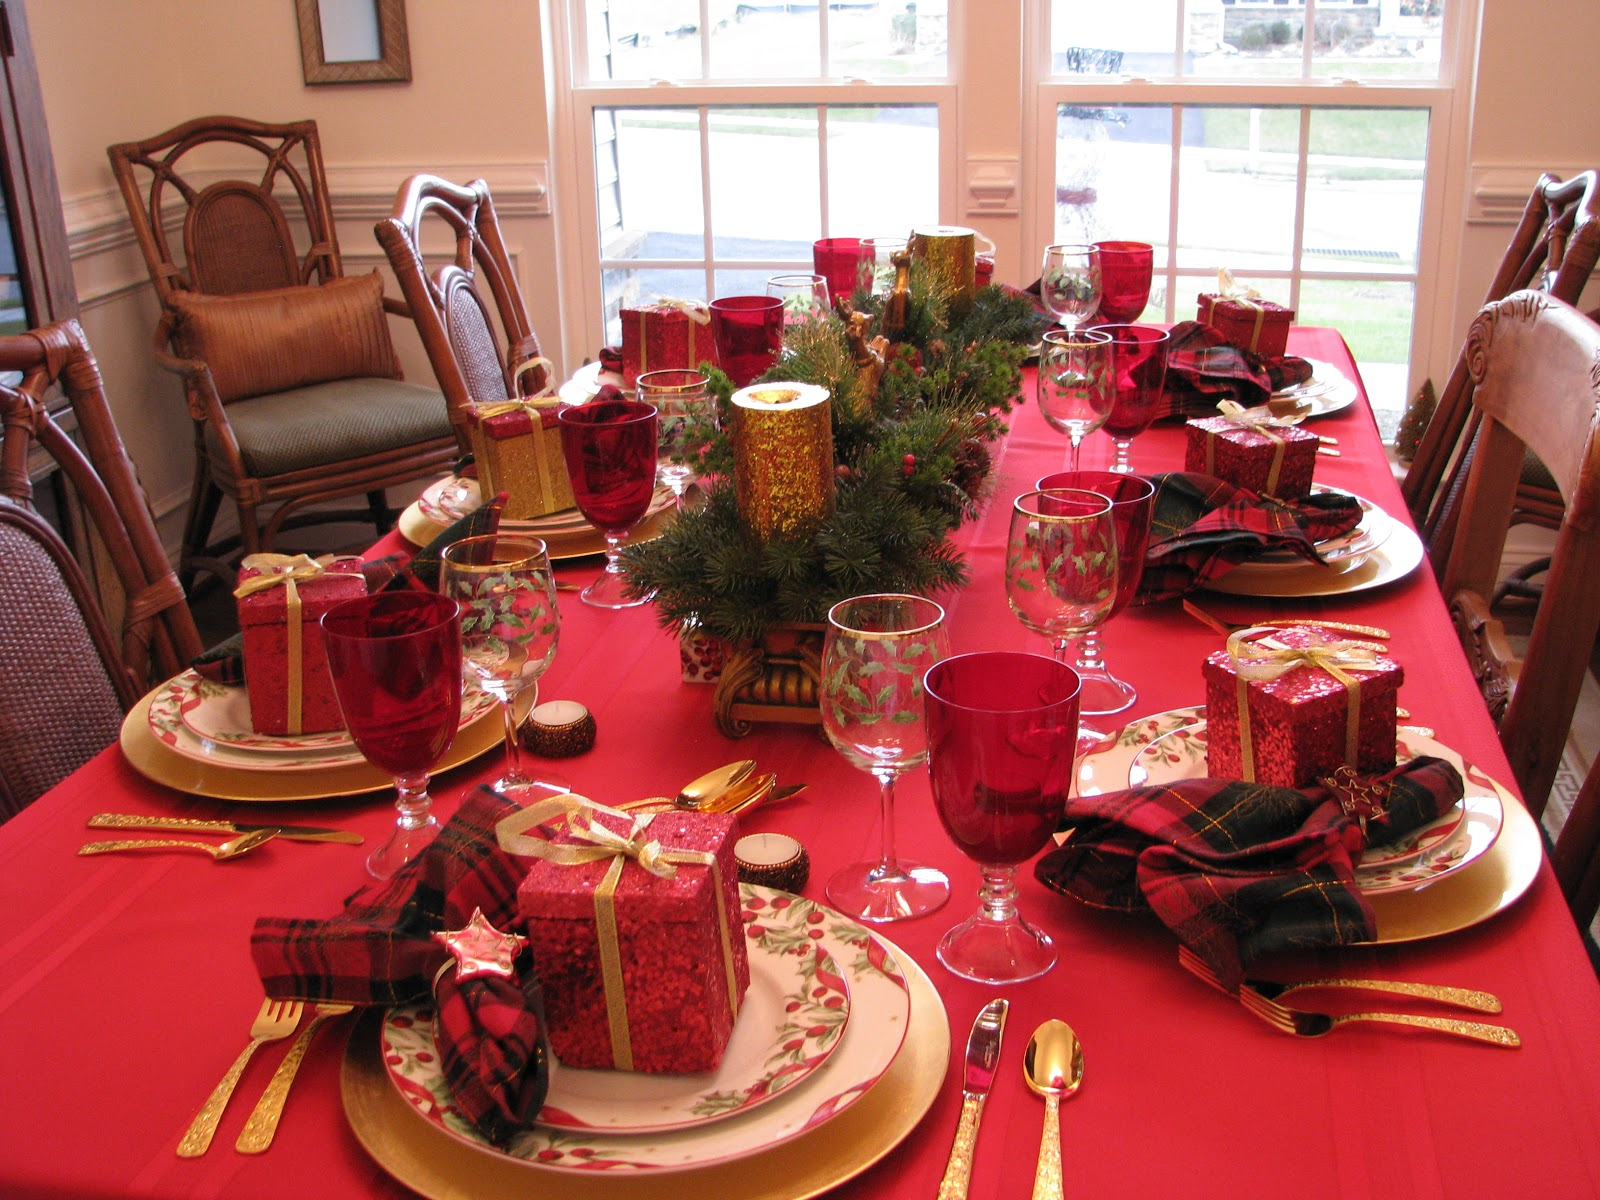 Christmas Eve Dinner Table Decorations